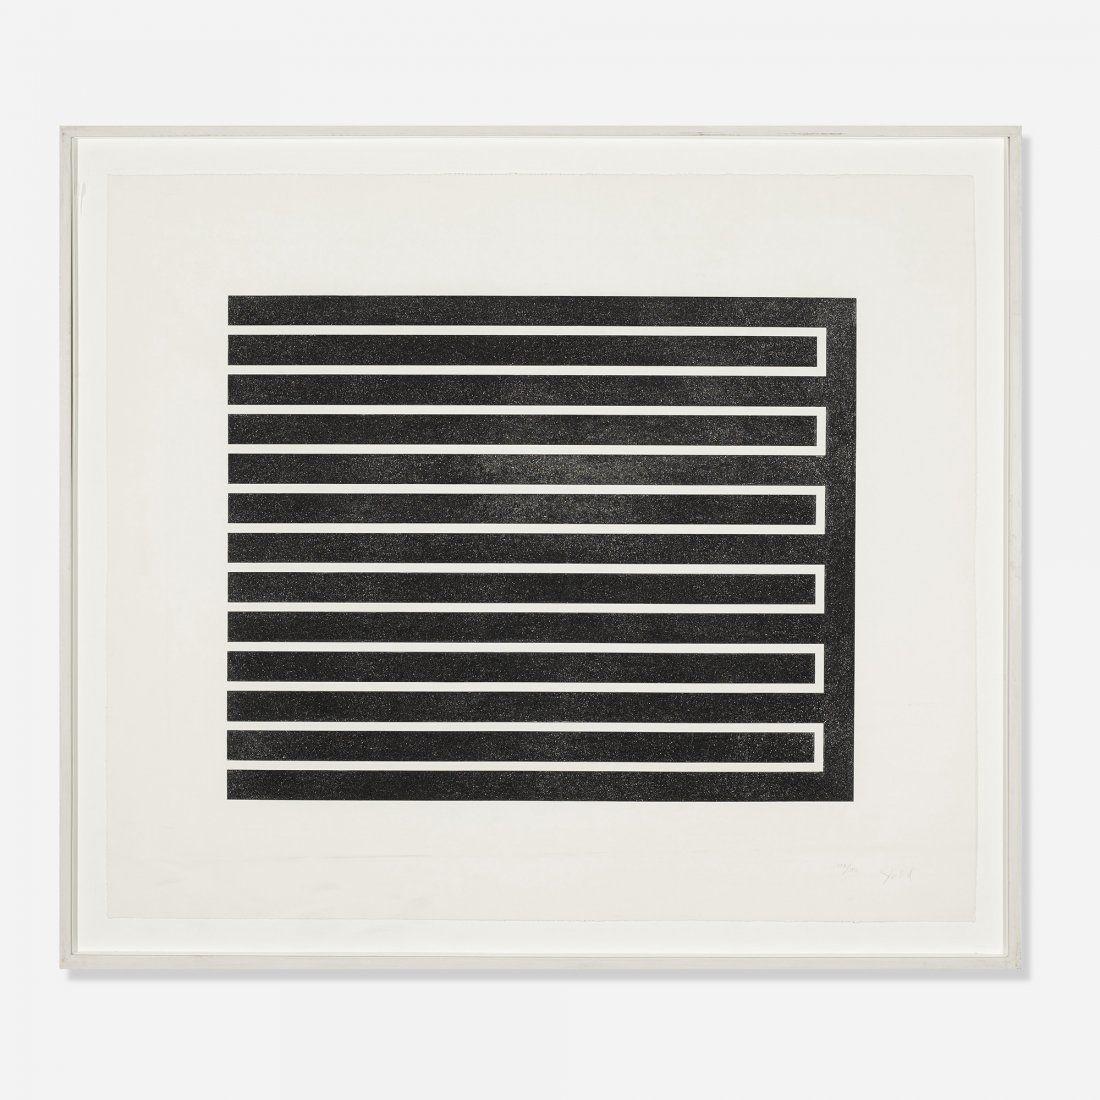 Donald Judd Untitled (122)